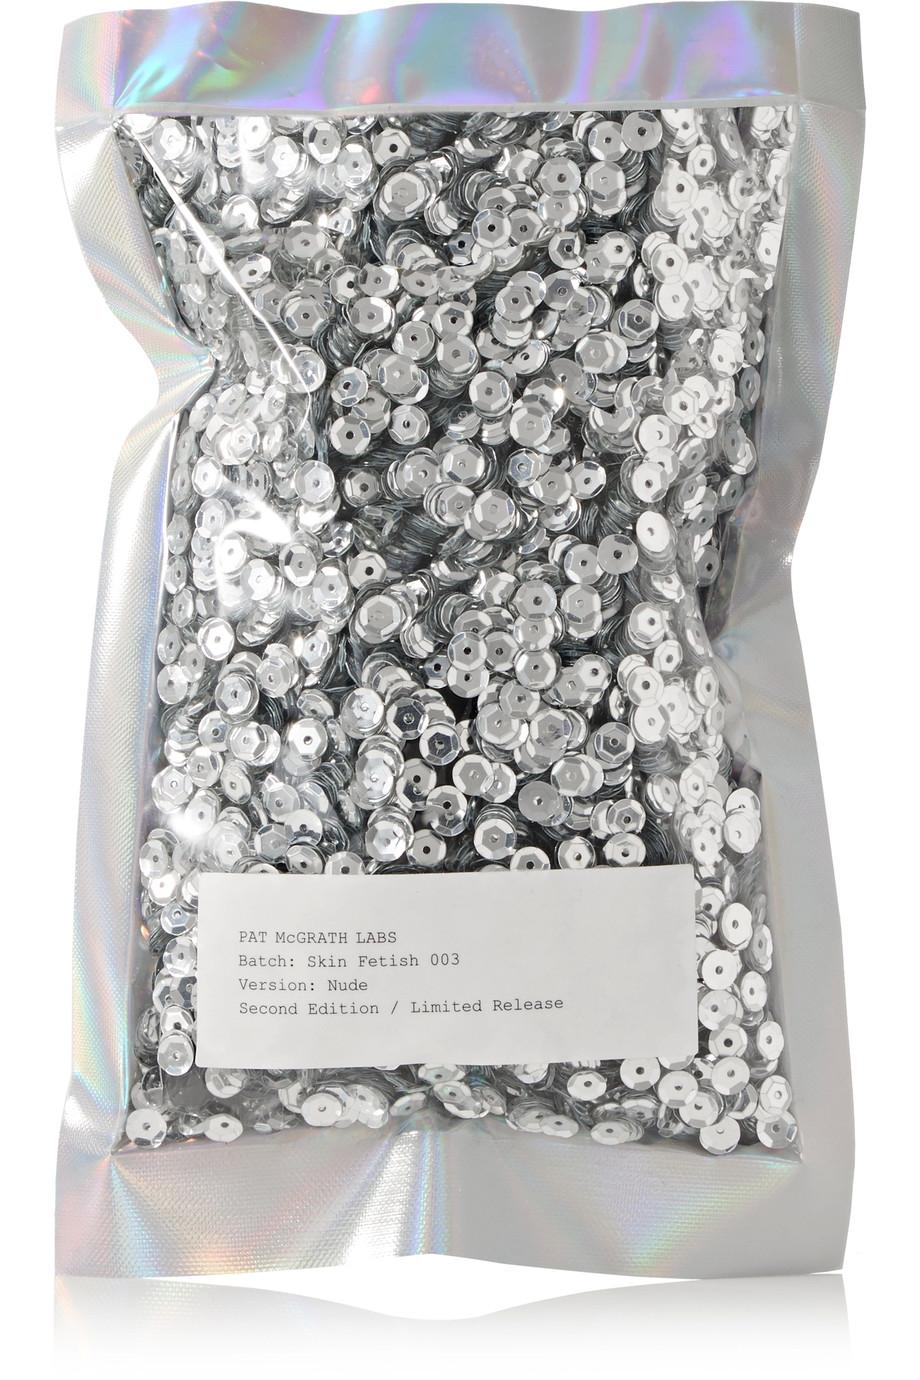 Pat McGrath Skin Fetish 003 Kit in Nude Bag.jpg